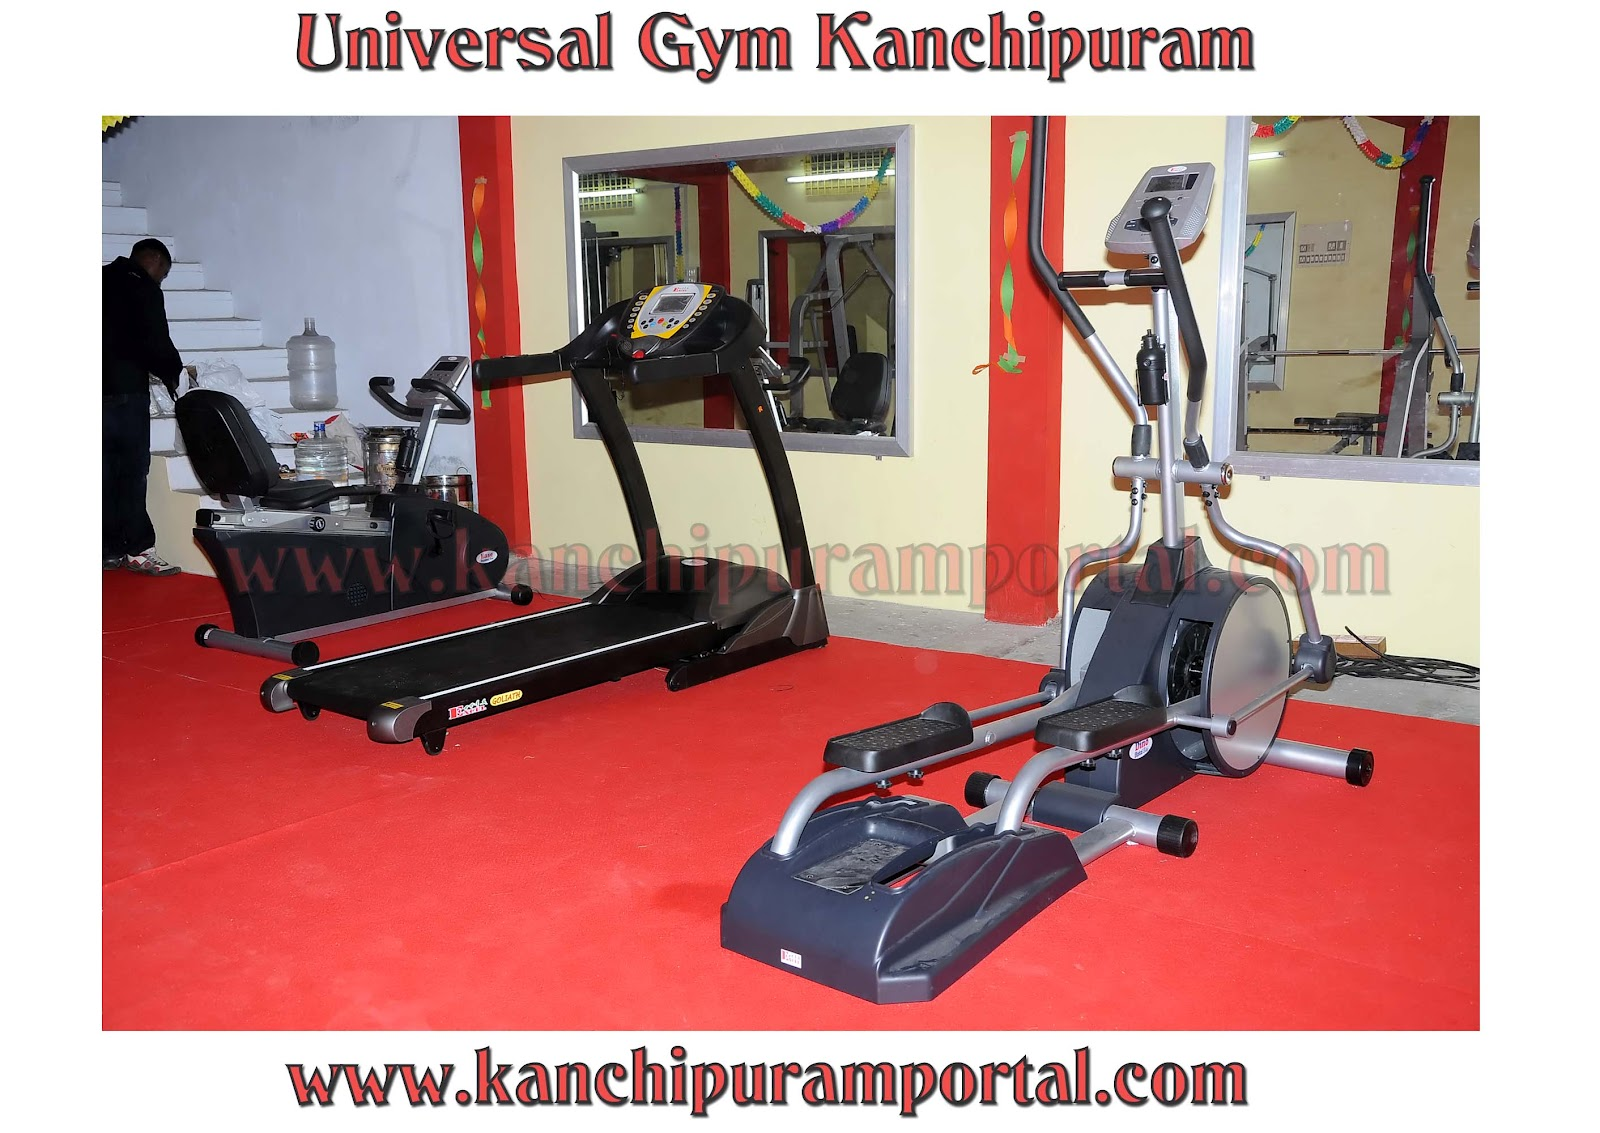 Universal - The Fitness Palace Kanchipuram Gyms